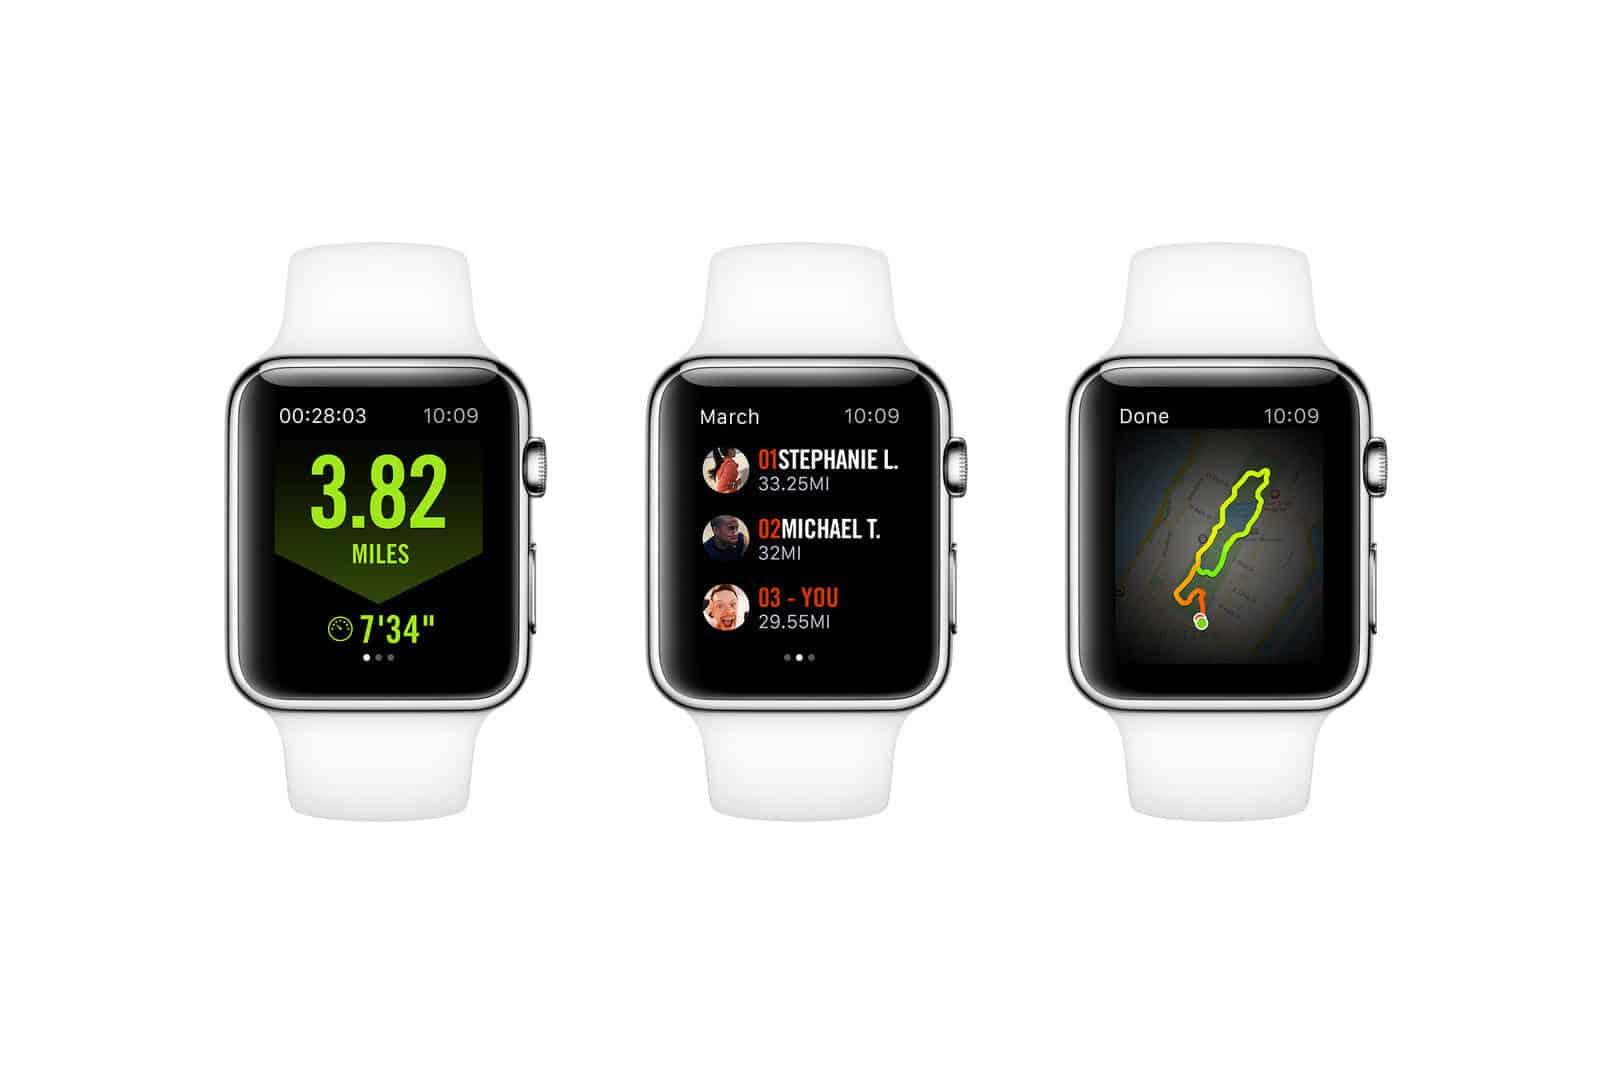 Nike Run Club Running App for Apple Watch